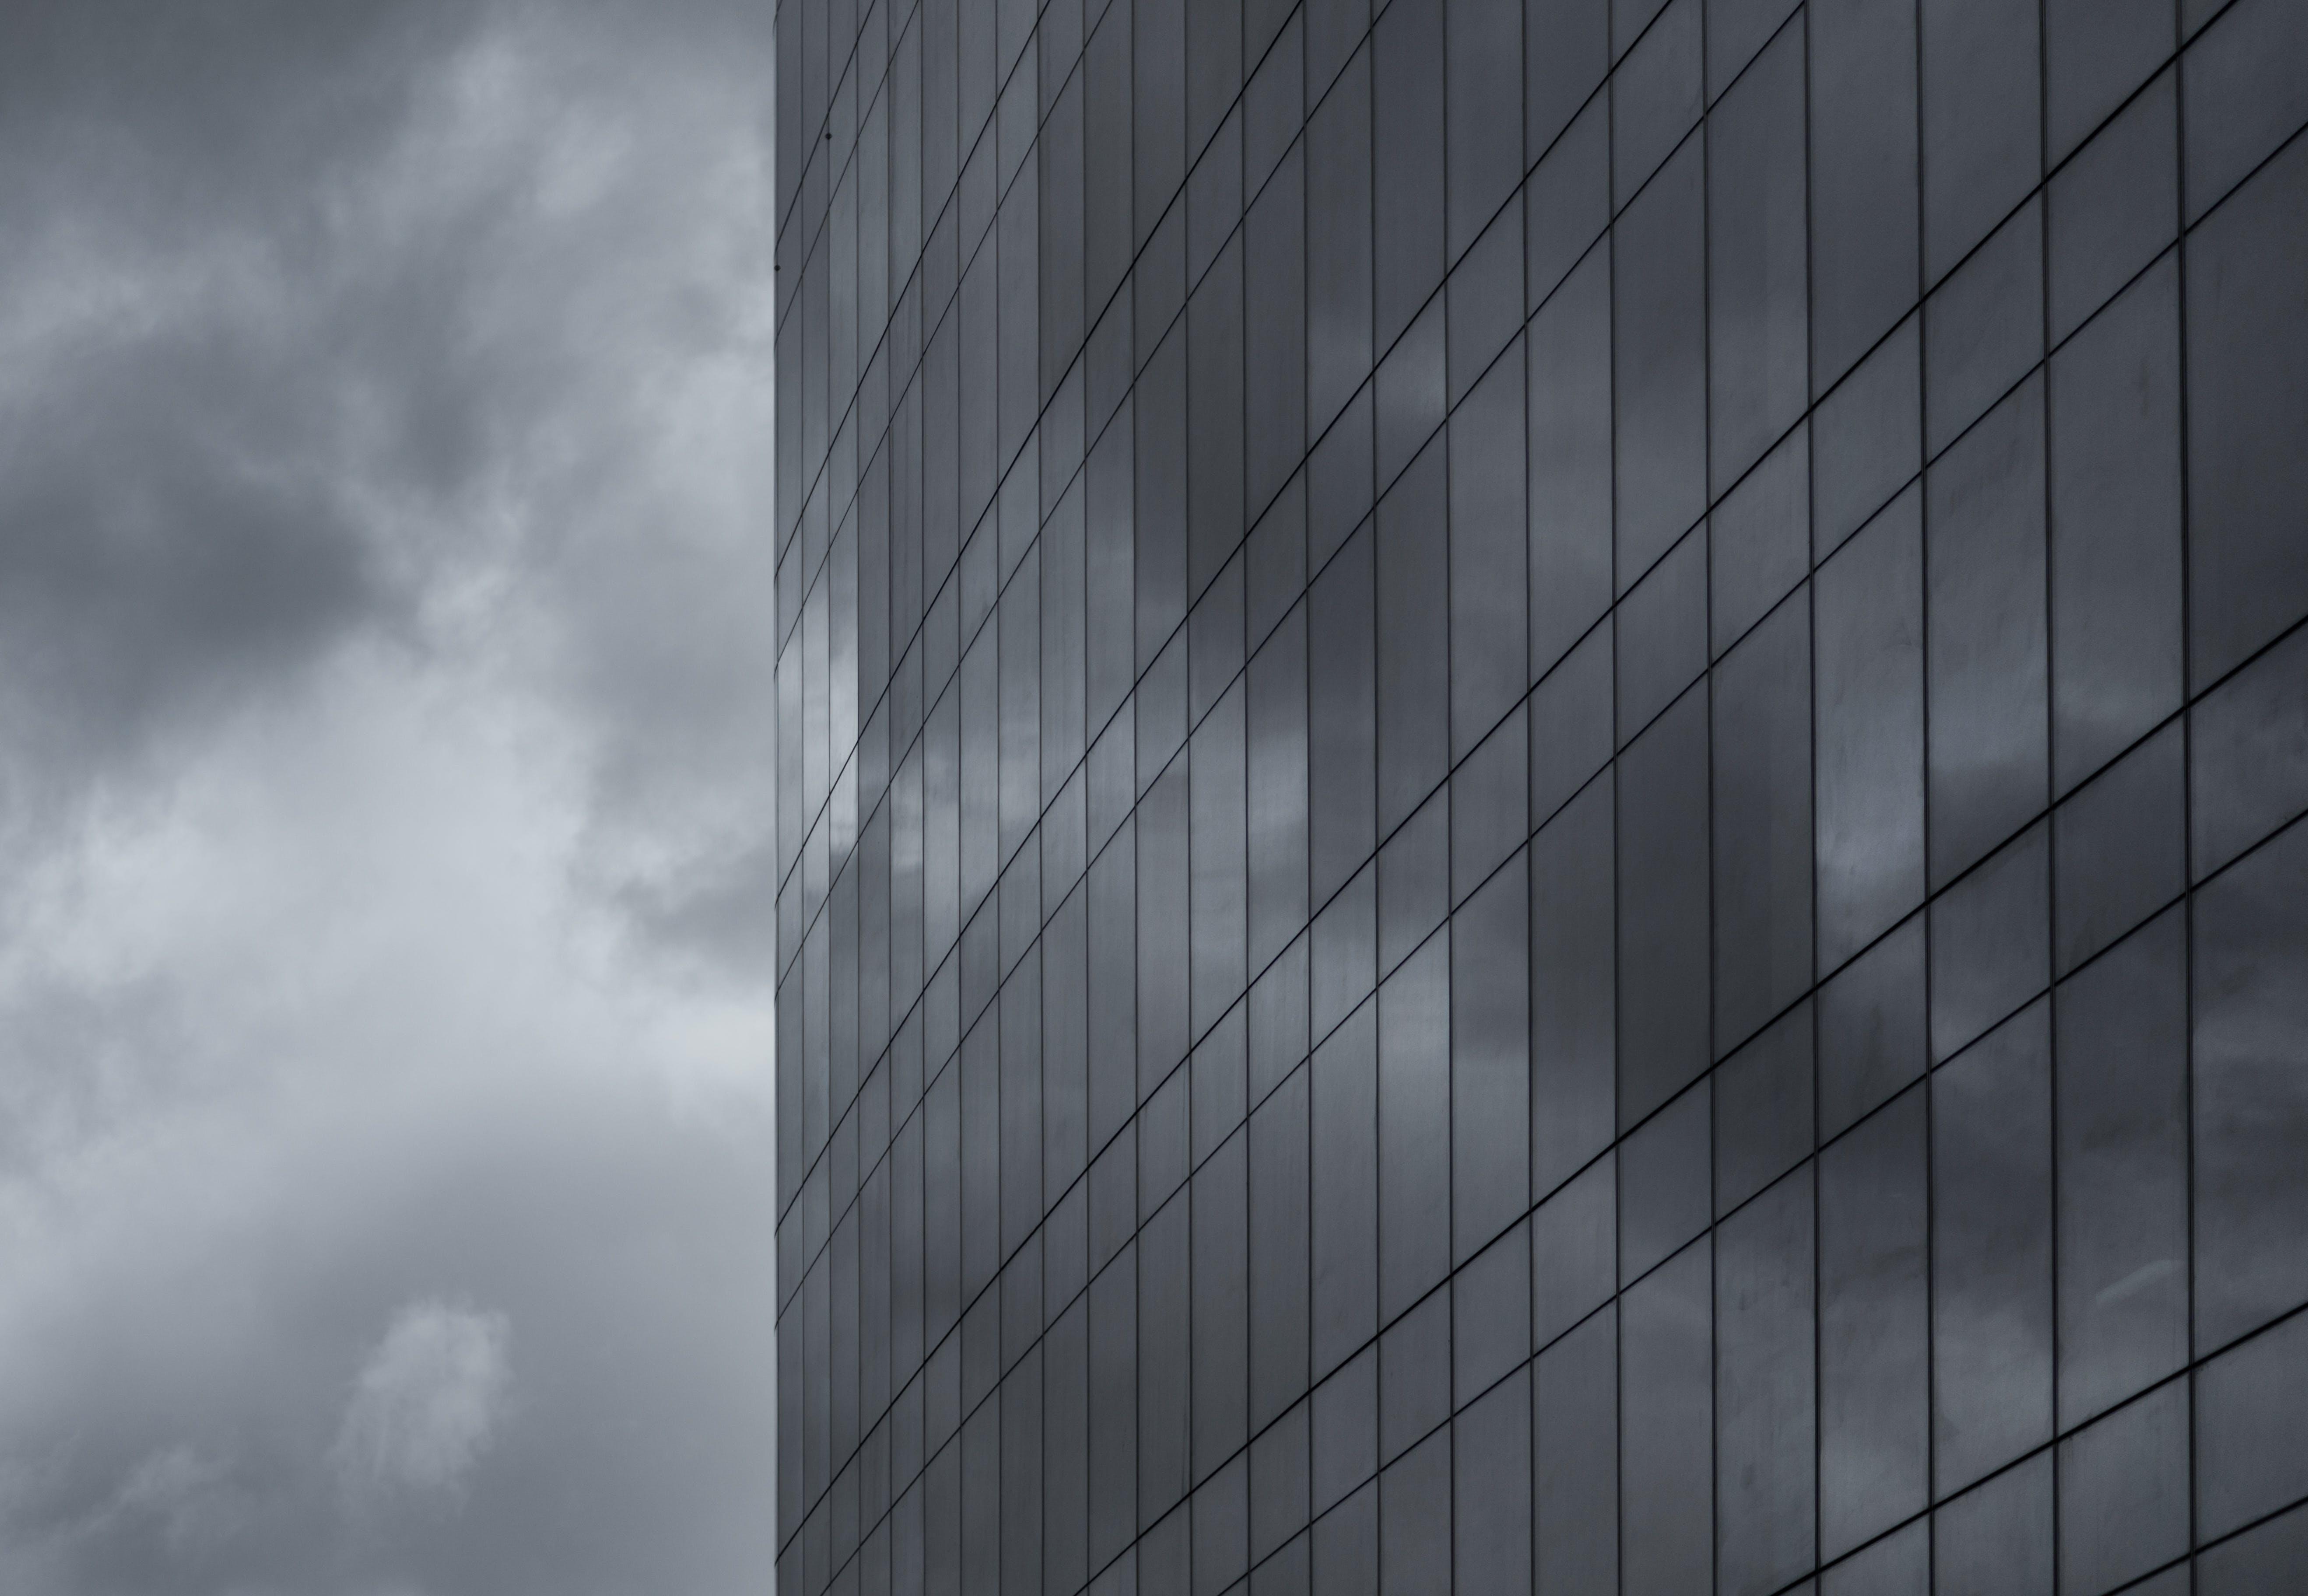 Gray Scale Window Photo